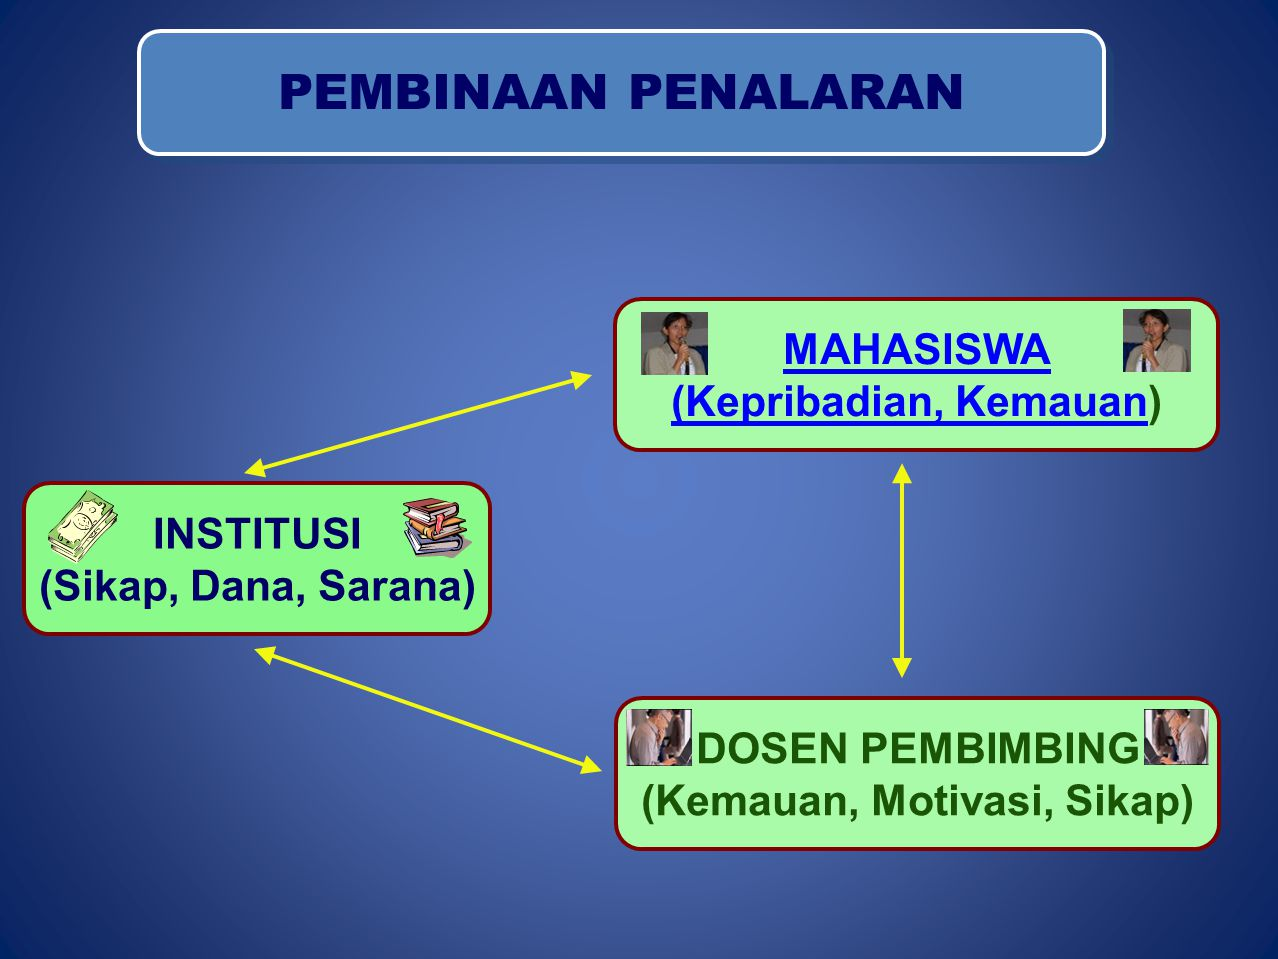 PEMBINAAN PENALARAN MAHASISWA (Kepribadian, Kemauan(Kepribadian, Kemauan) INSTITUSI (Sikap, Dana, Sarana) DOSEN PEMBIMBING (Kemauan, Motivasi, Sikap)